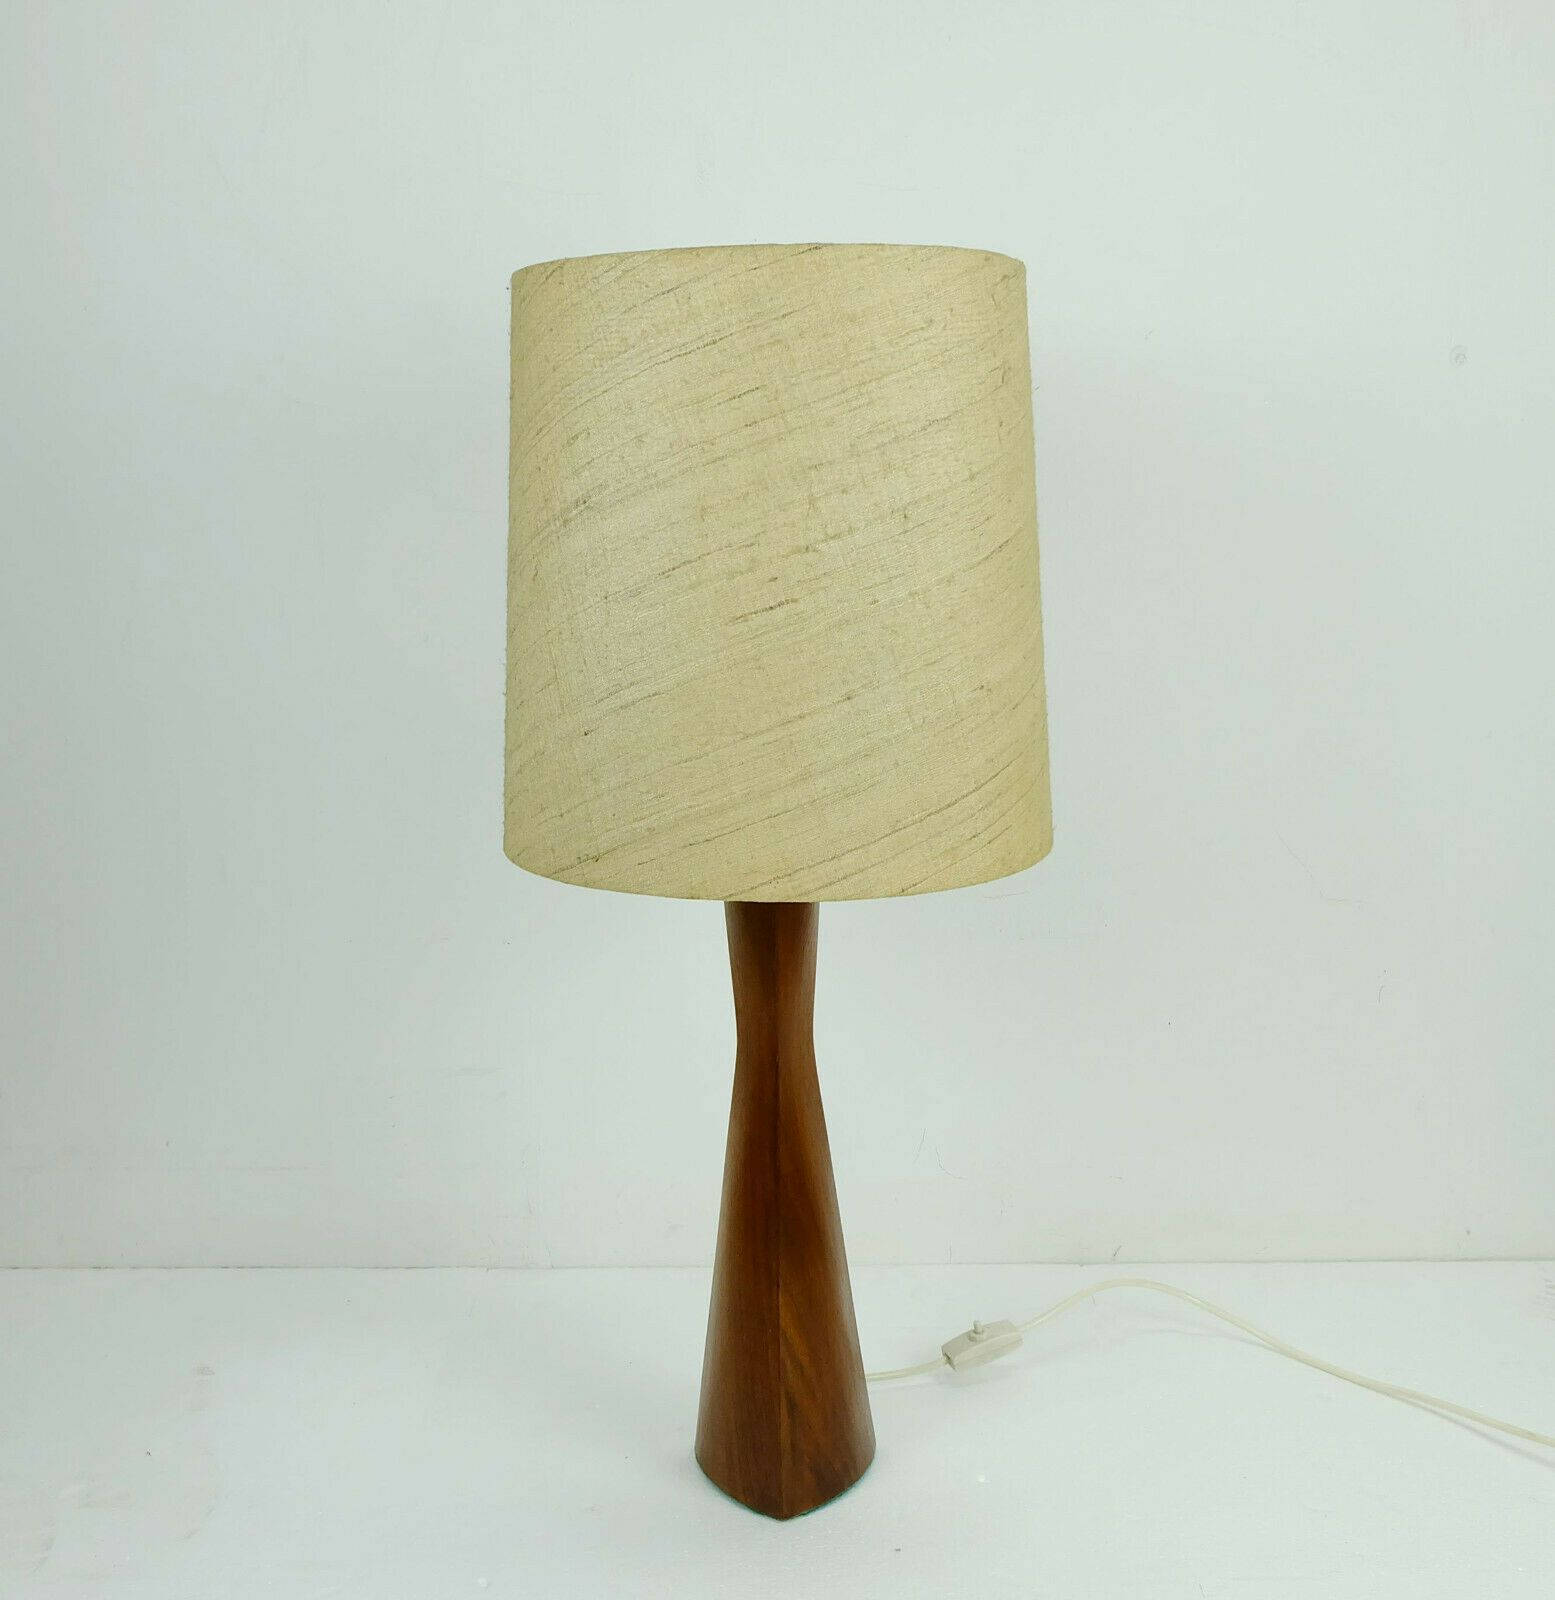 A Beautiful Elegant Teak Table Lamp